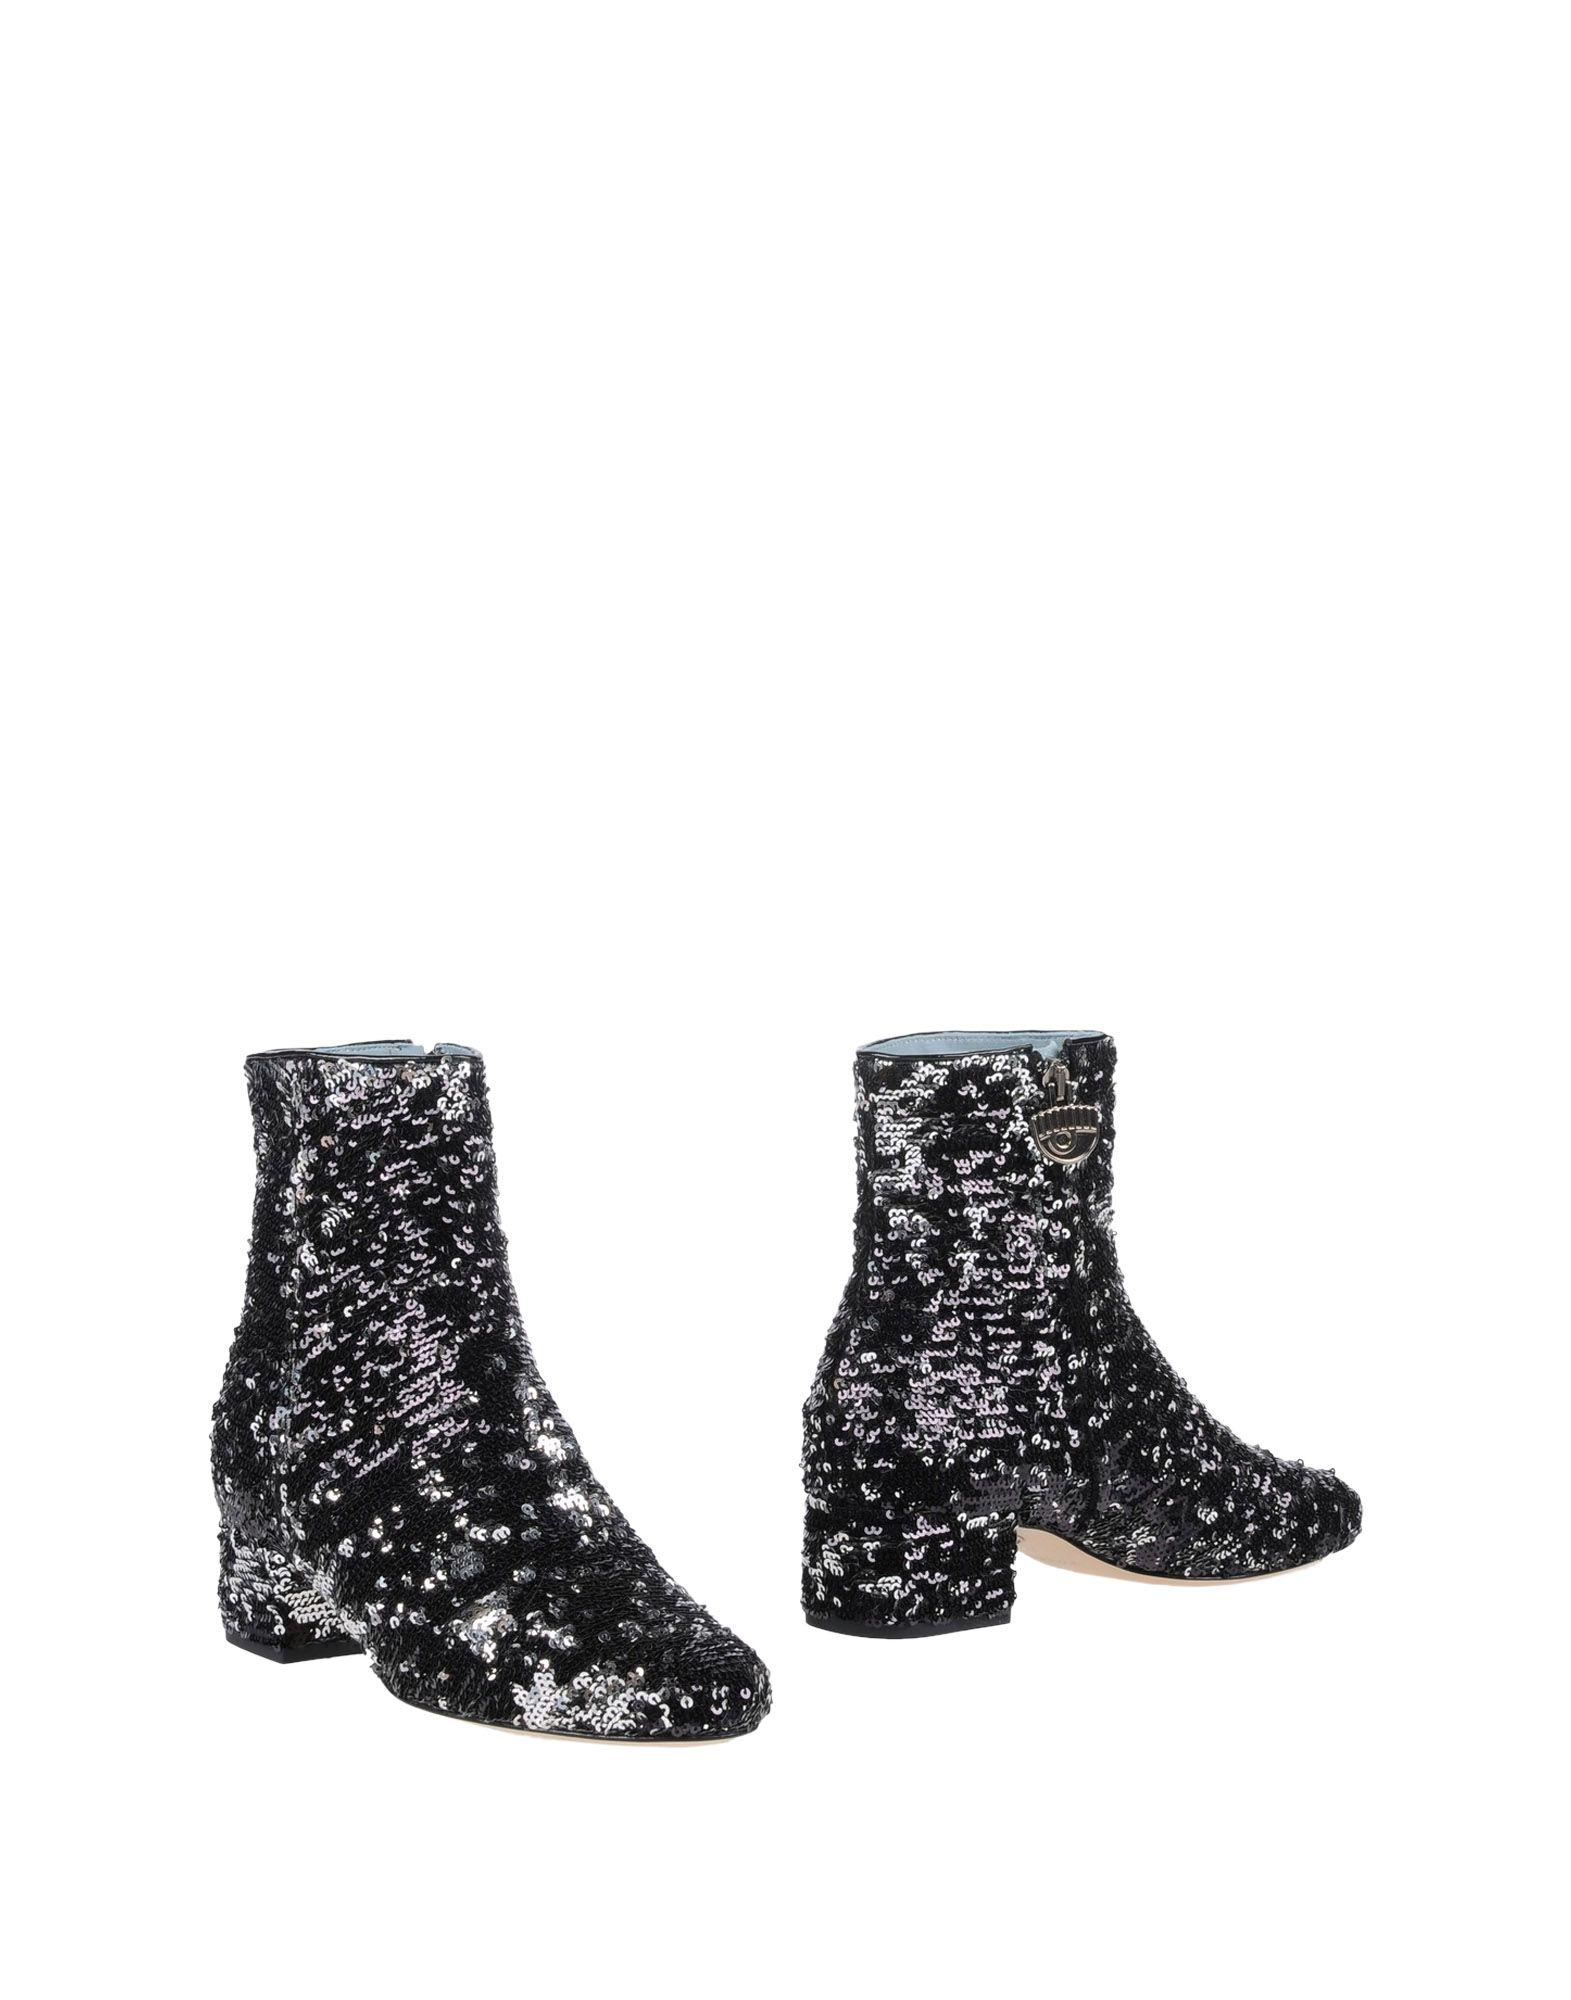 Rabatt Schuhe Chiara Ferragni Stiefelette Damen  11452993FL